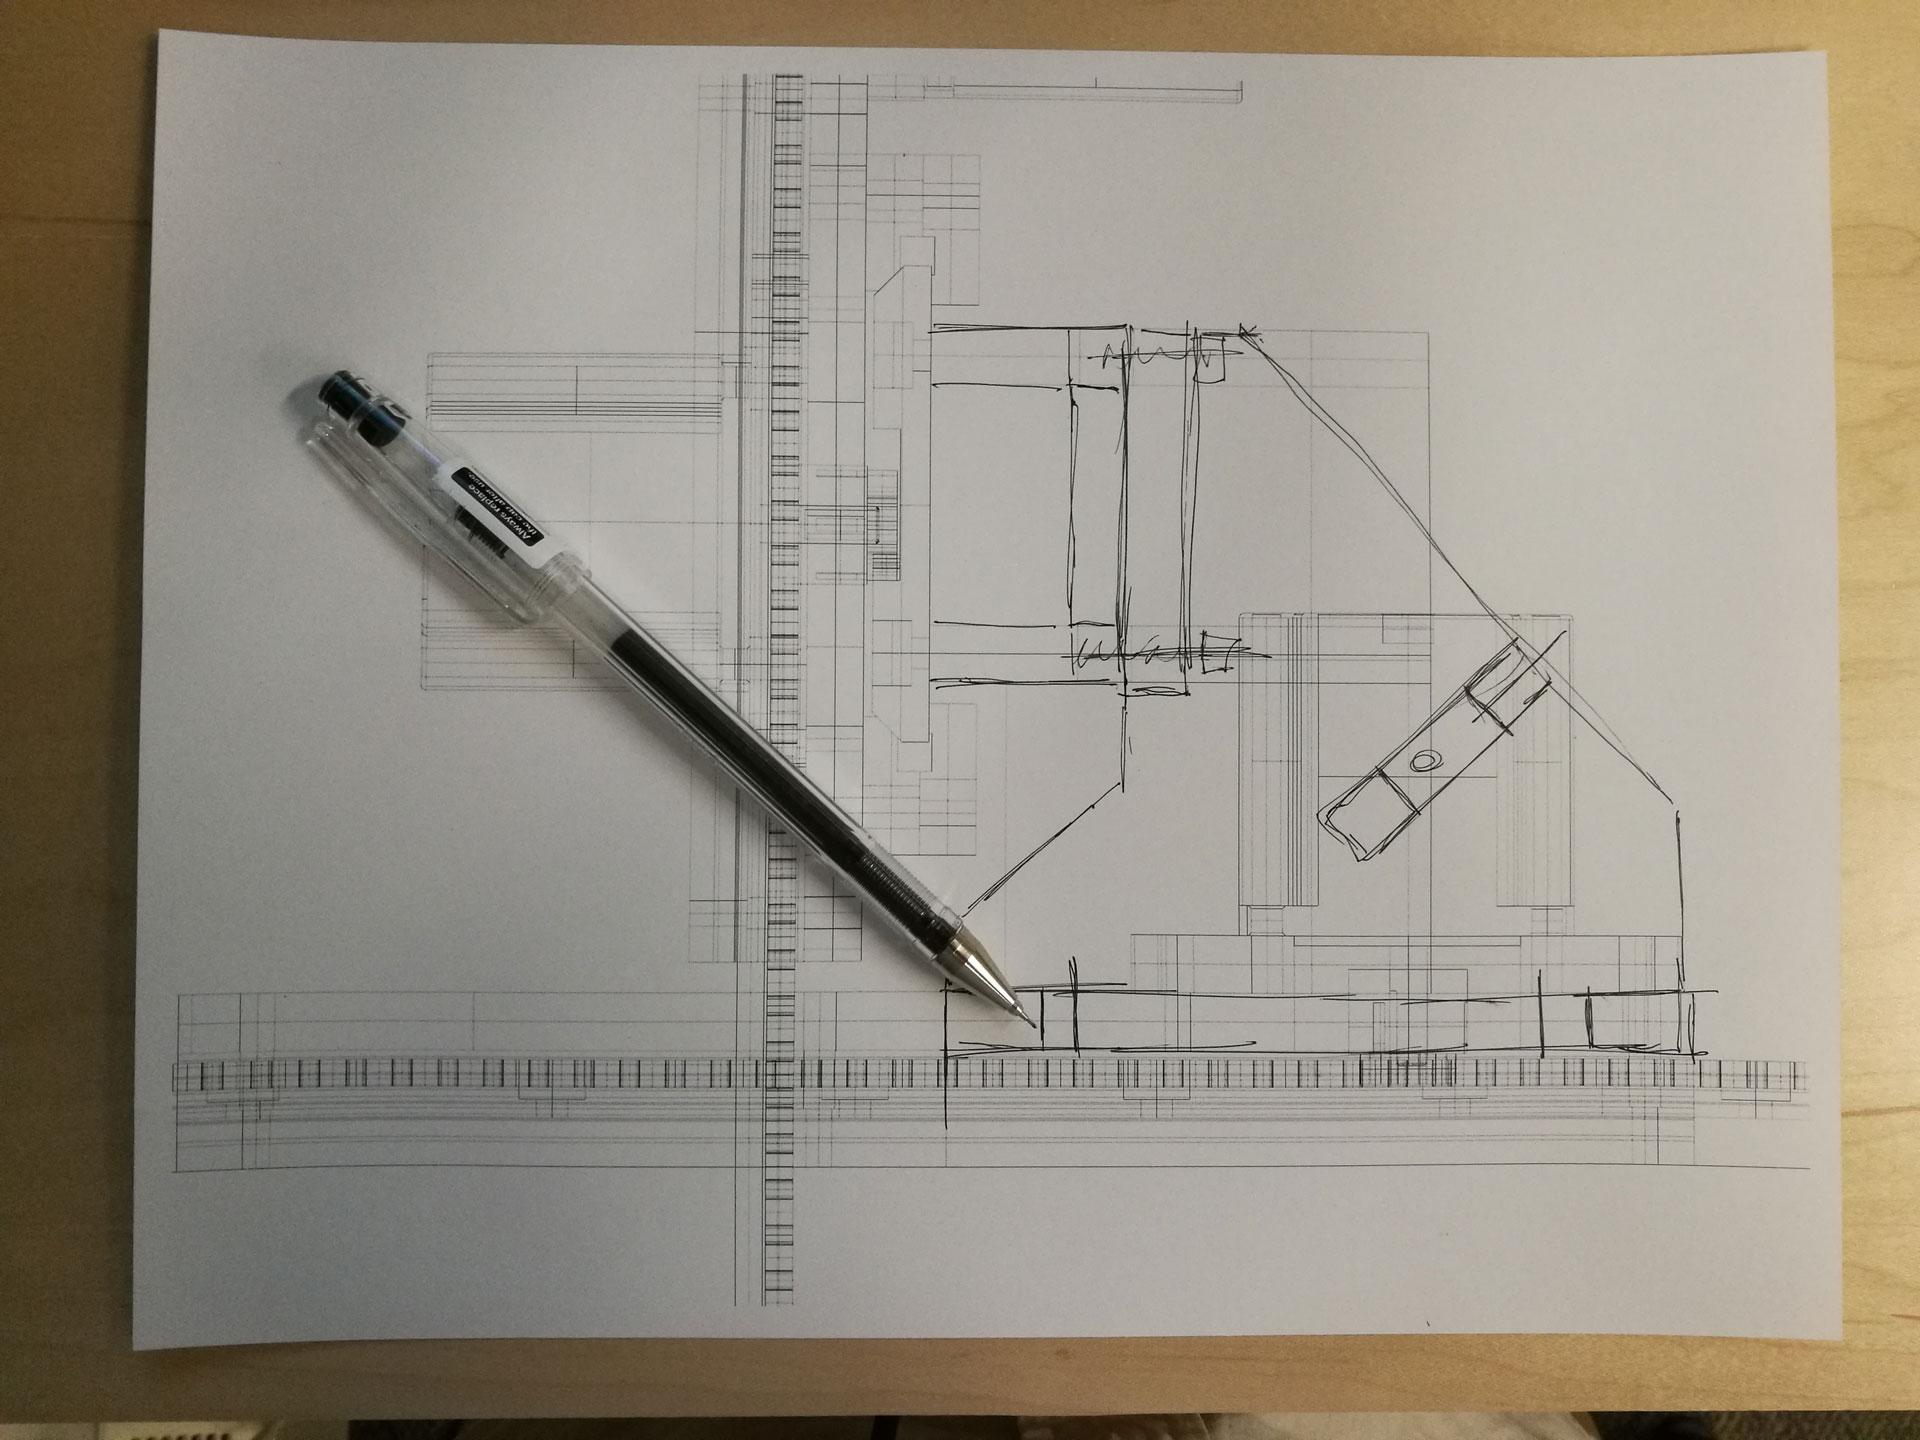 images/layout-box-y-sketch.jpg